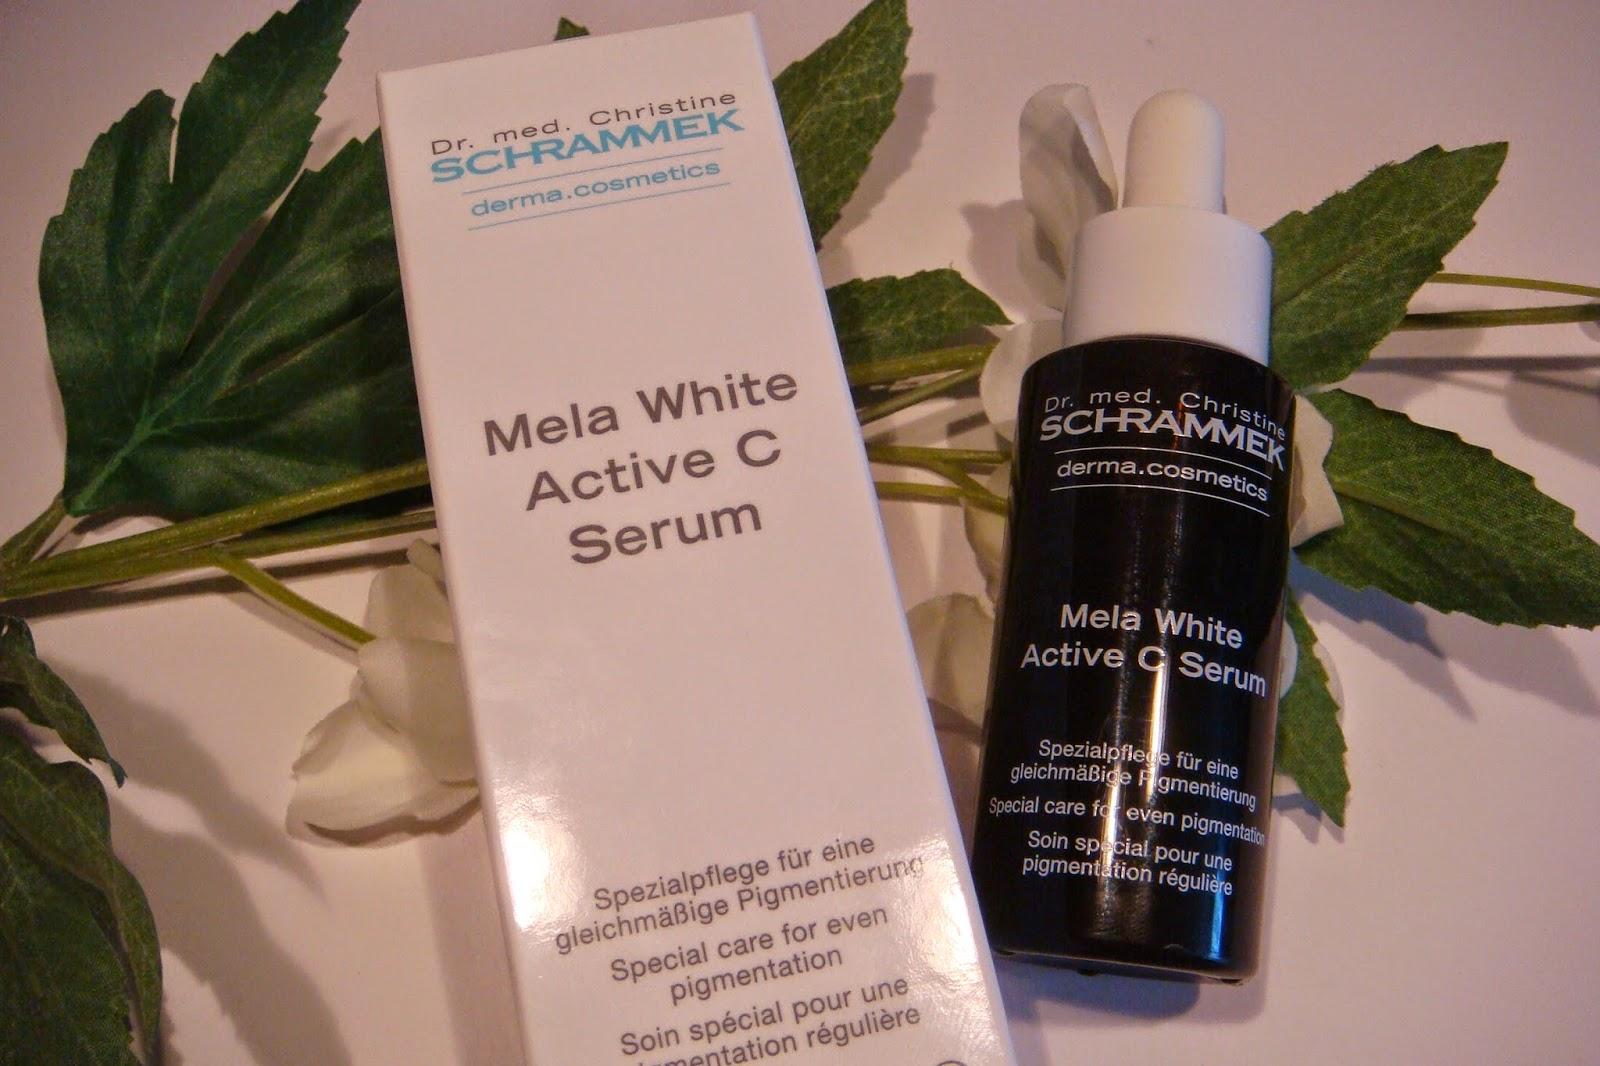 MELA WHITE de Dr. med. Christine Schrammek Kosmetik.